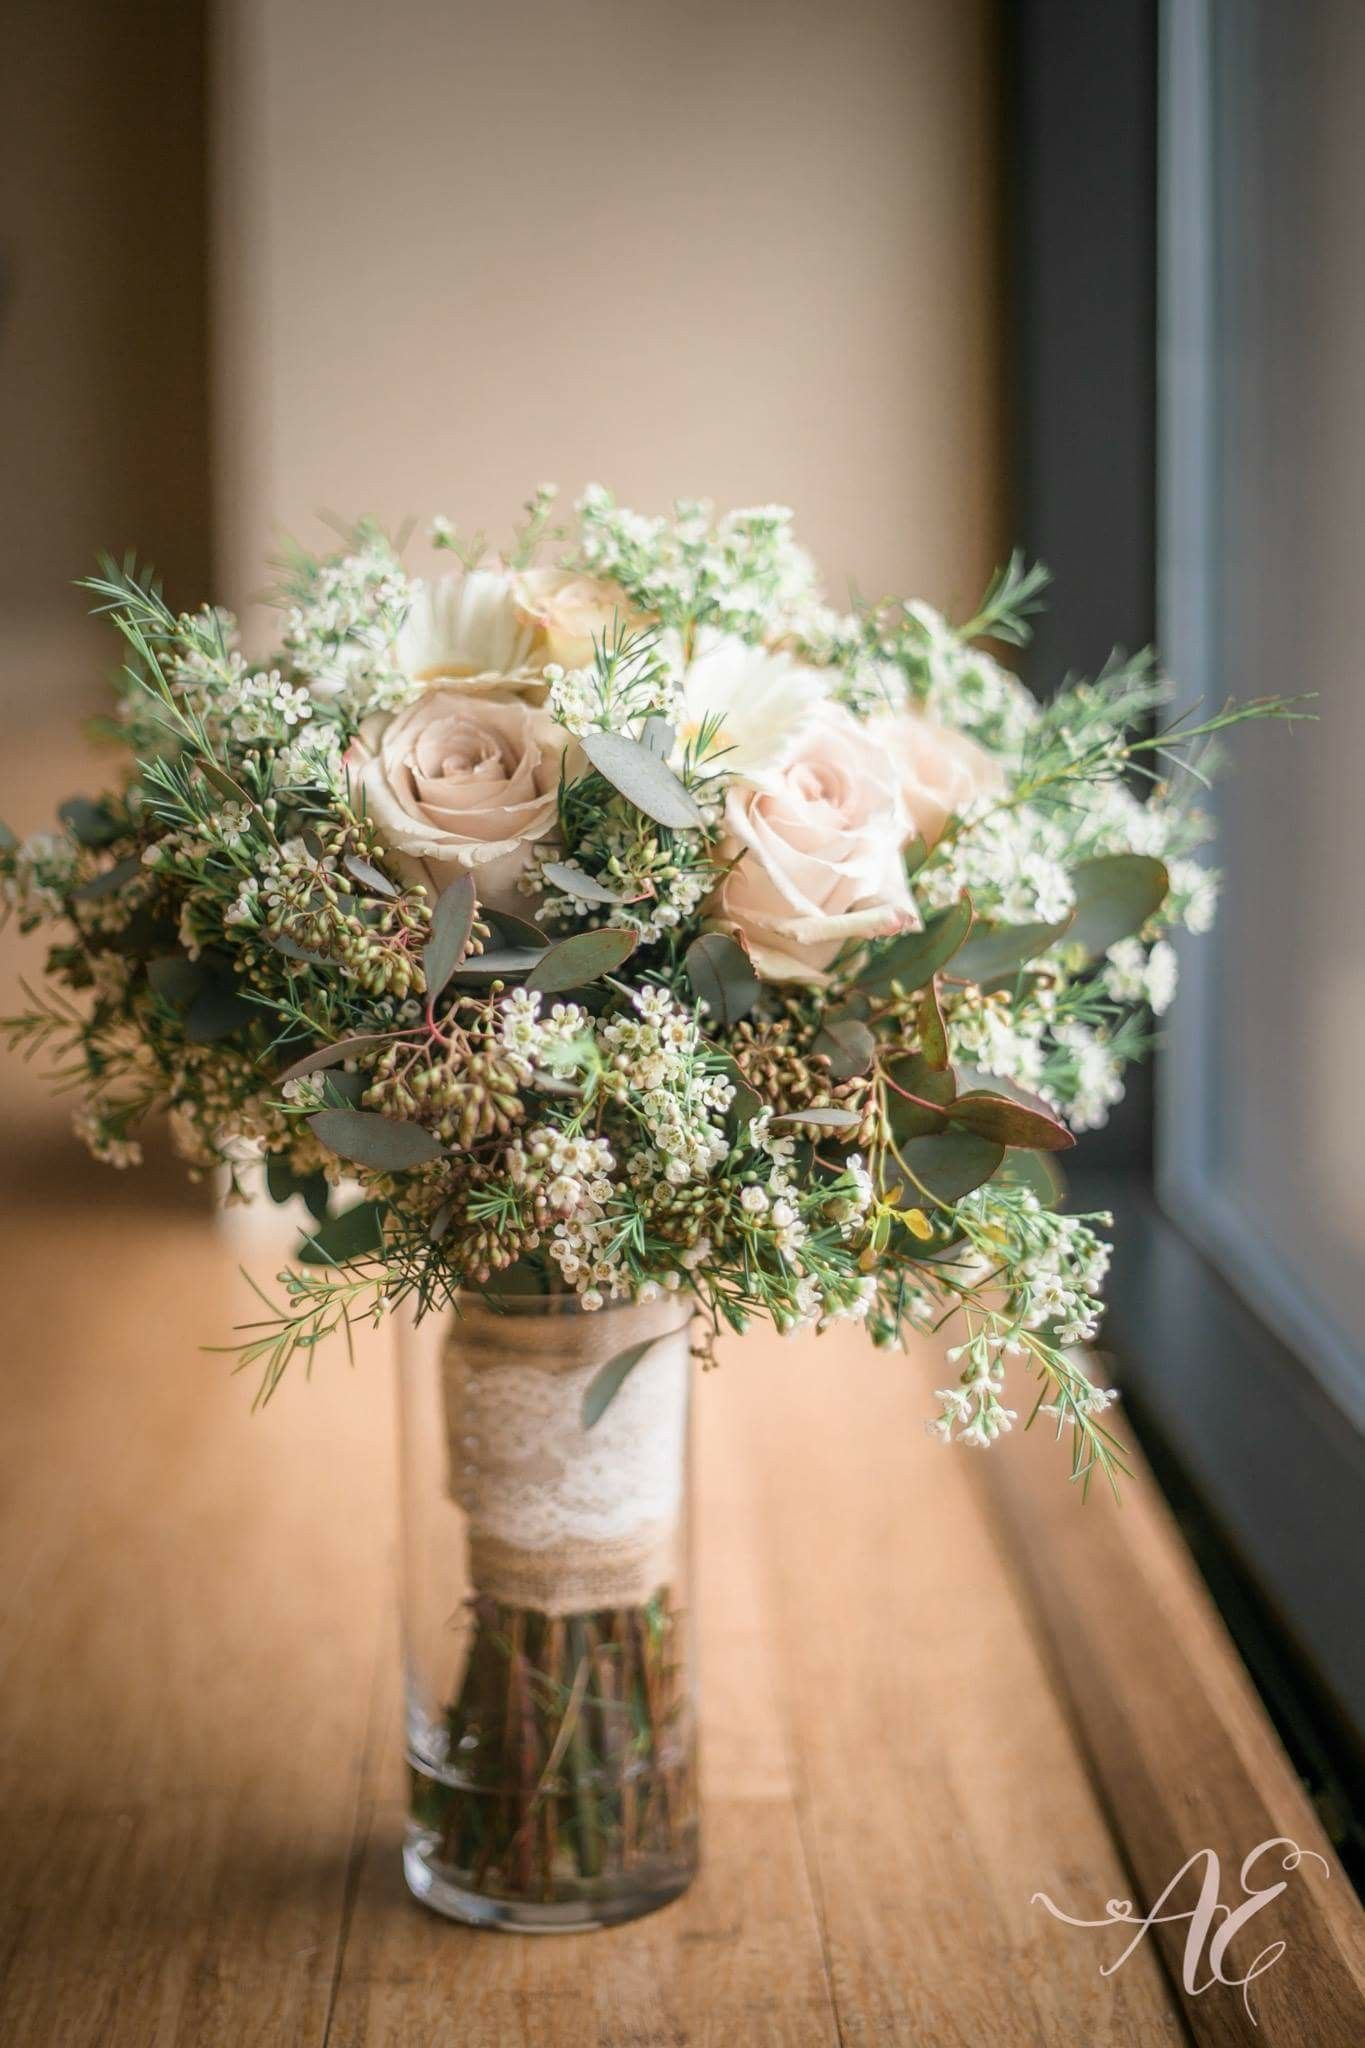 Gerbera daisy blush bouquet The Blue Chrysanthemum Weddings